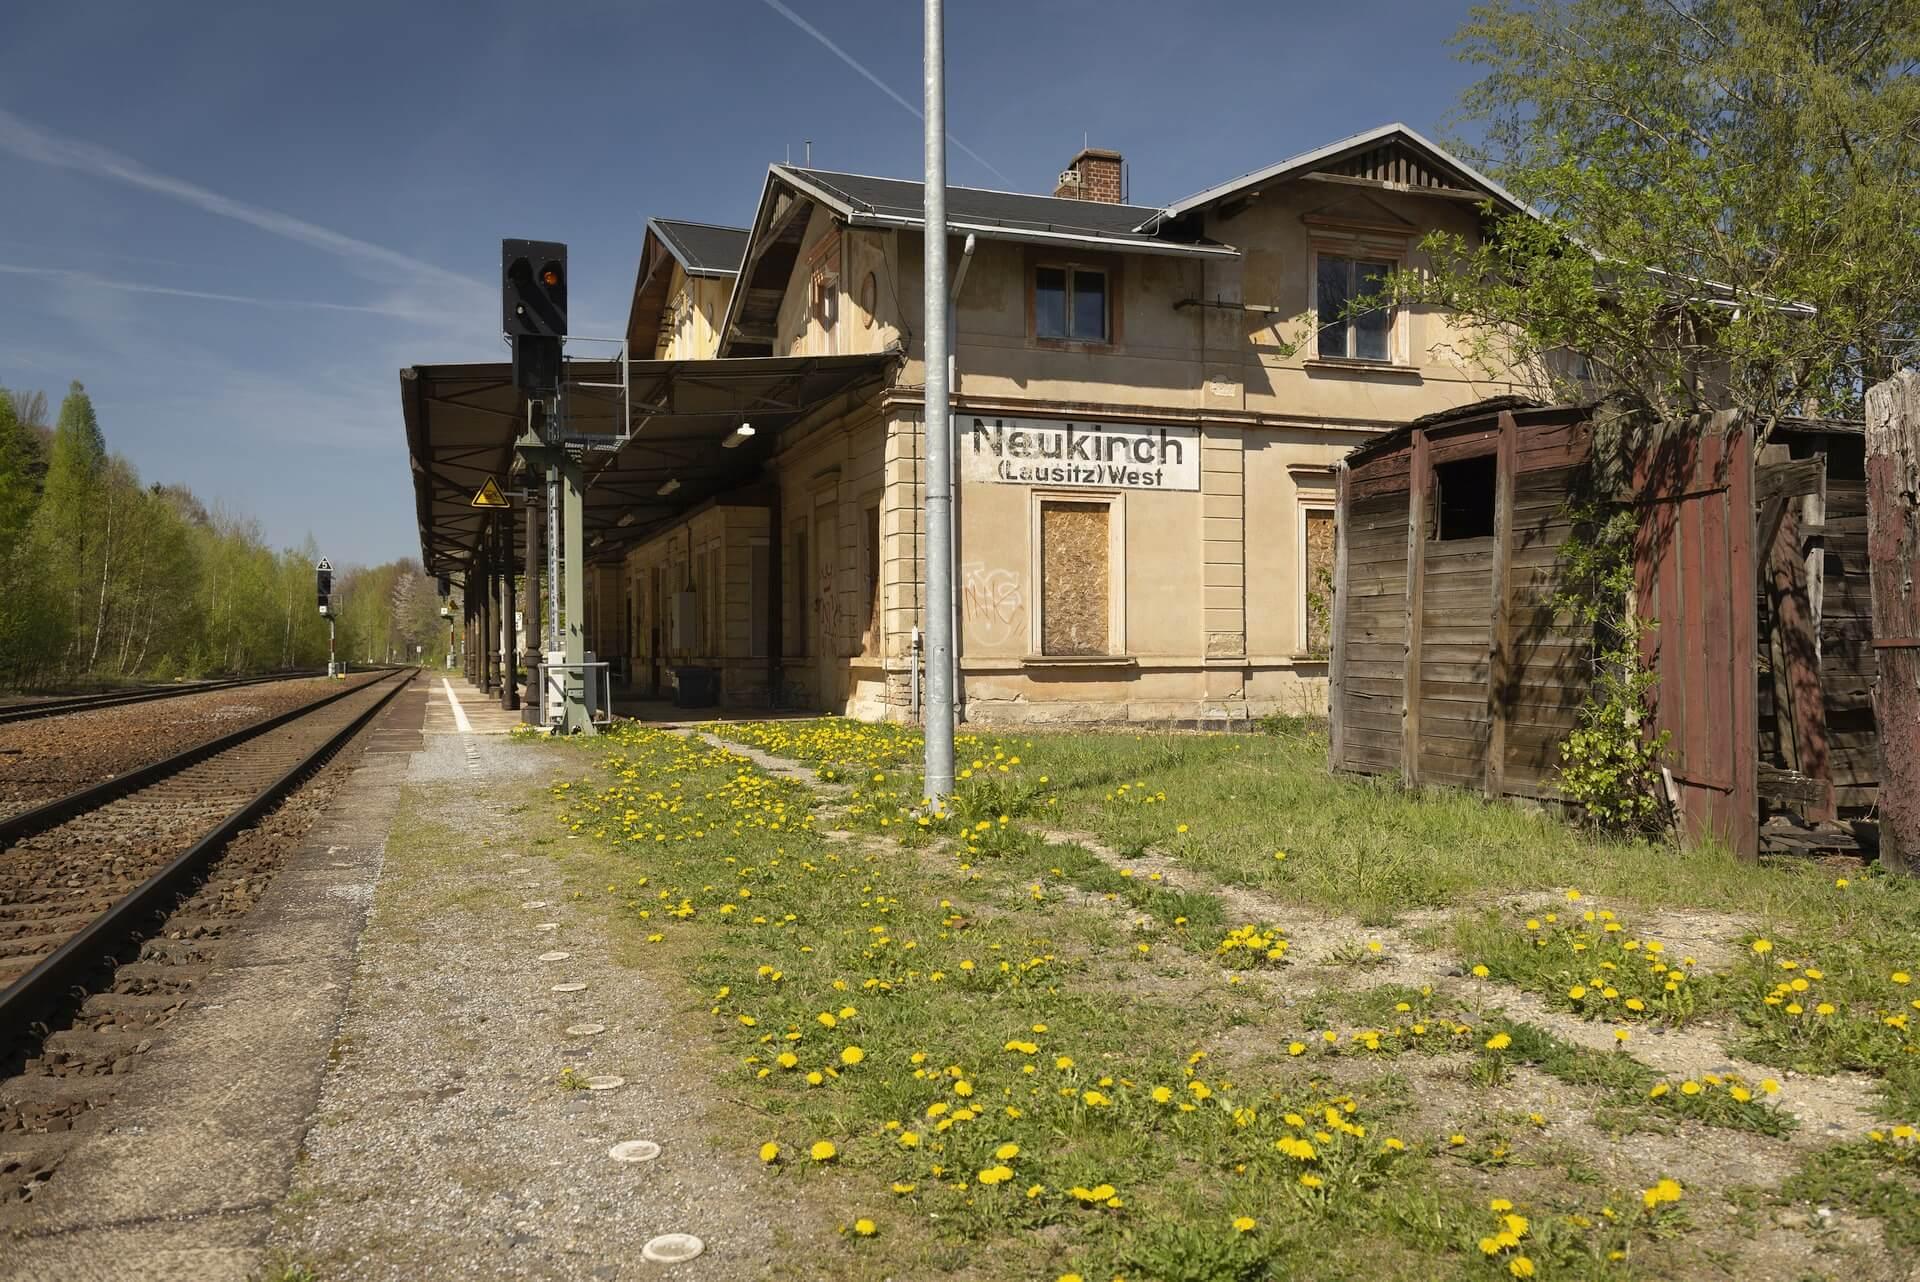 Bahnhof Neukirch/West